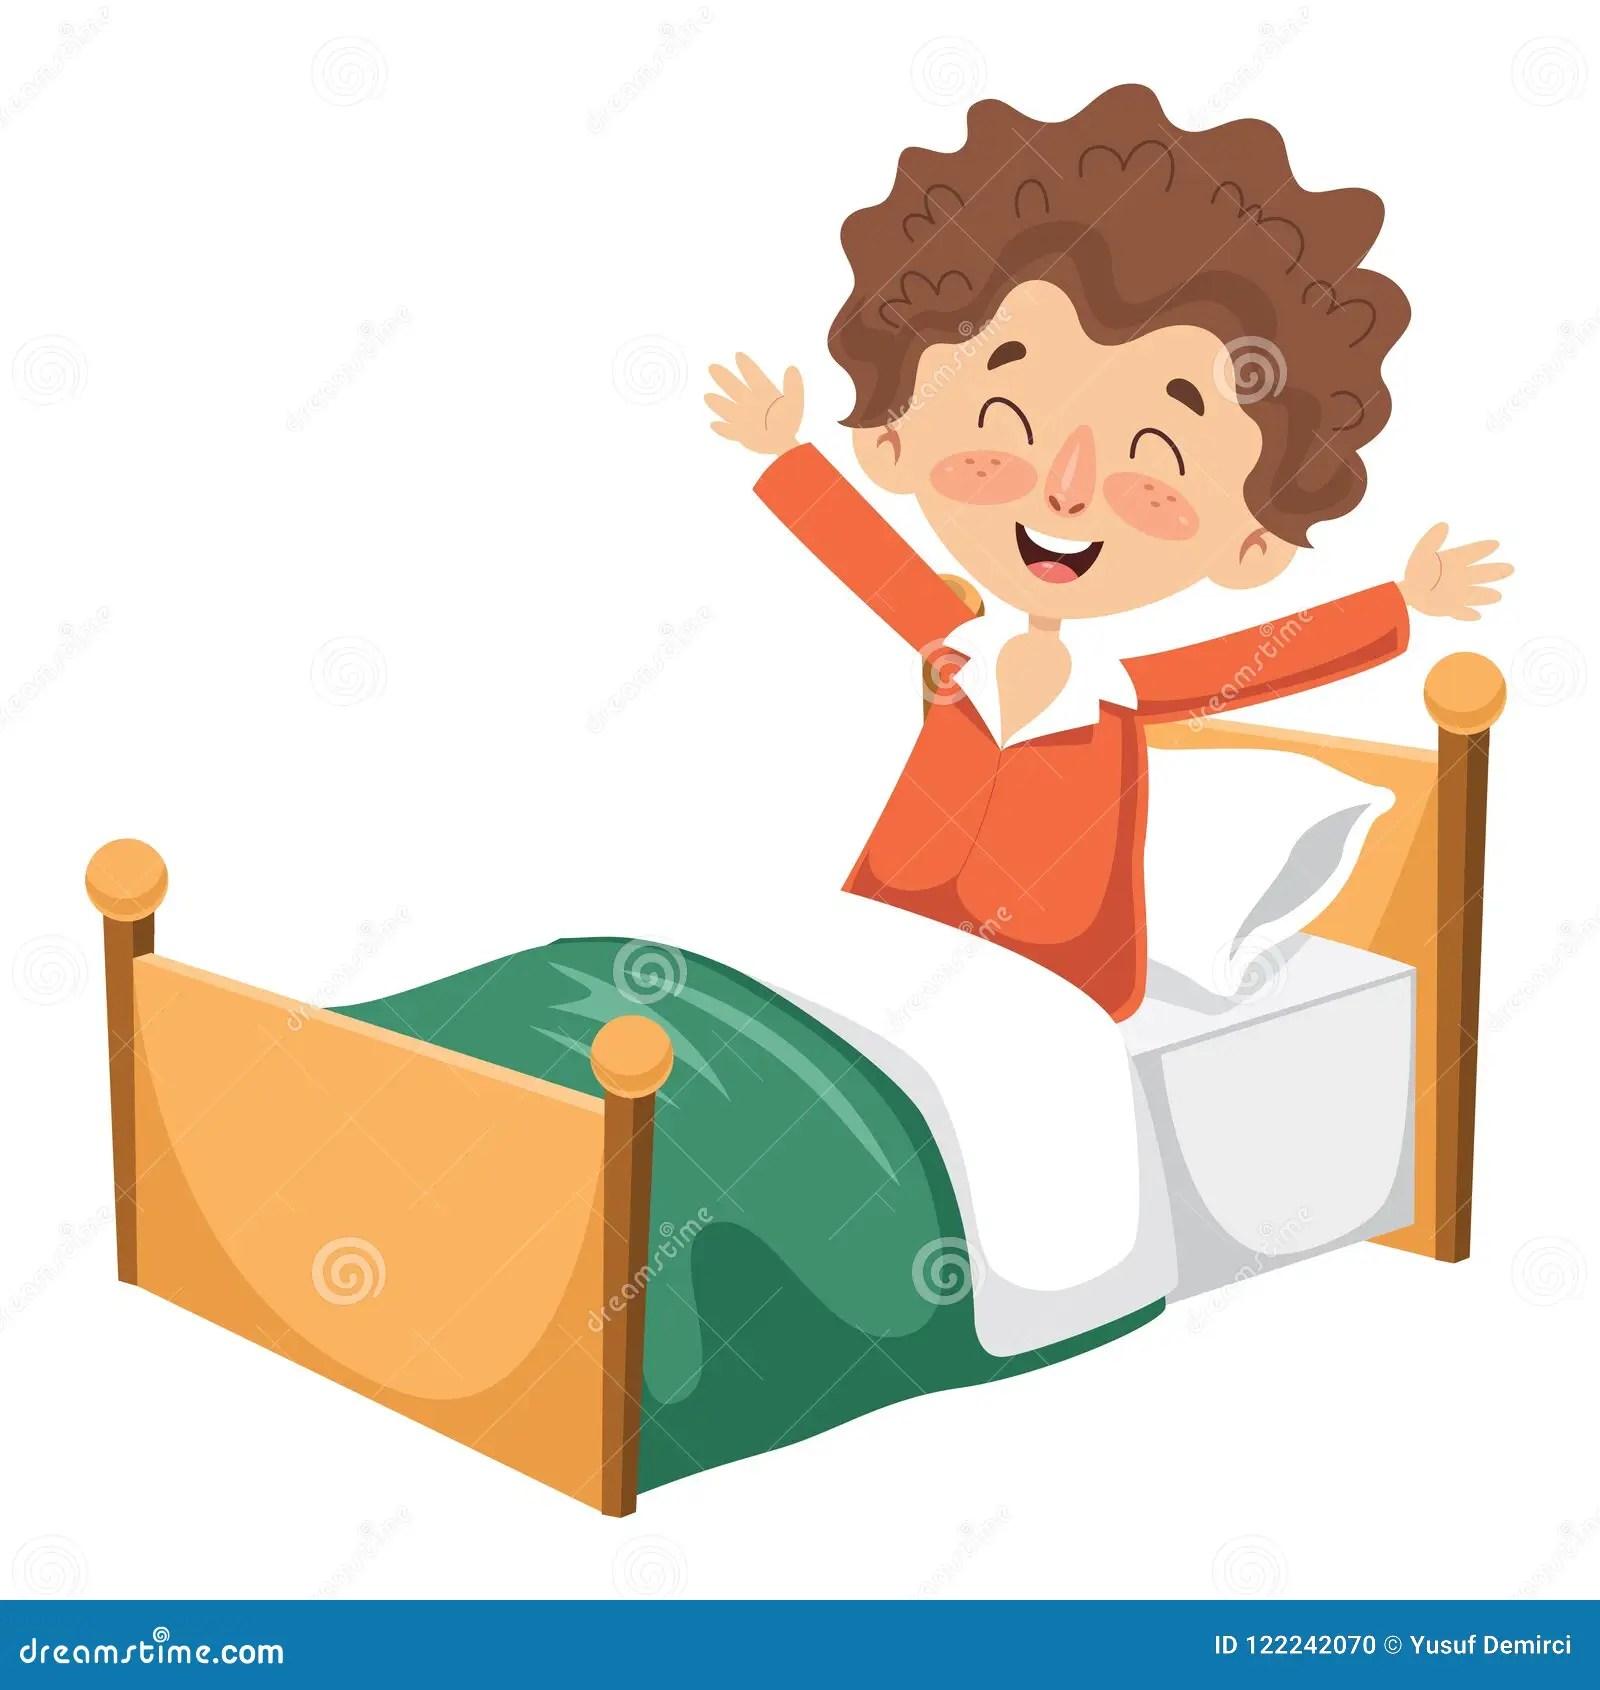 hight resolution of vector illustration of kid waking up